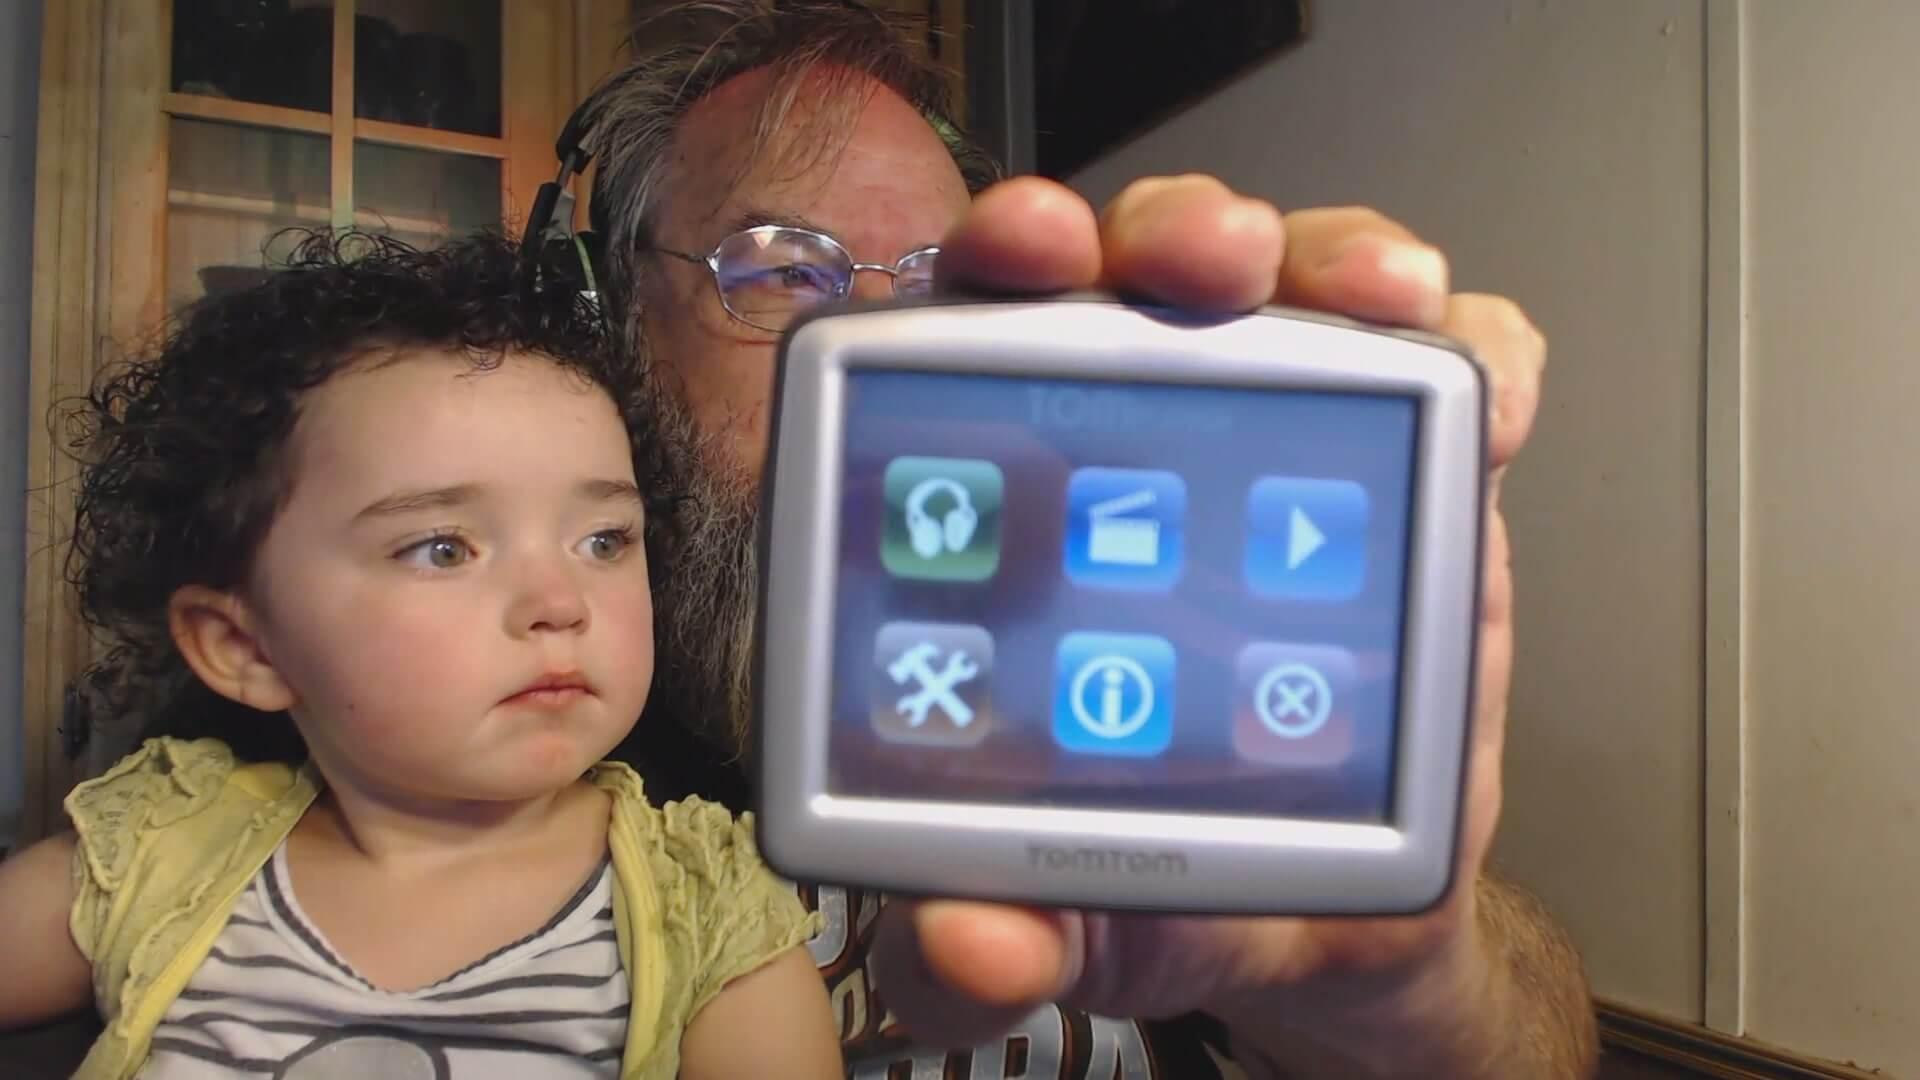 TomTom GPS Re-purposing into Media Player - Dragon Blogger